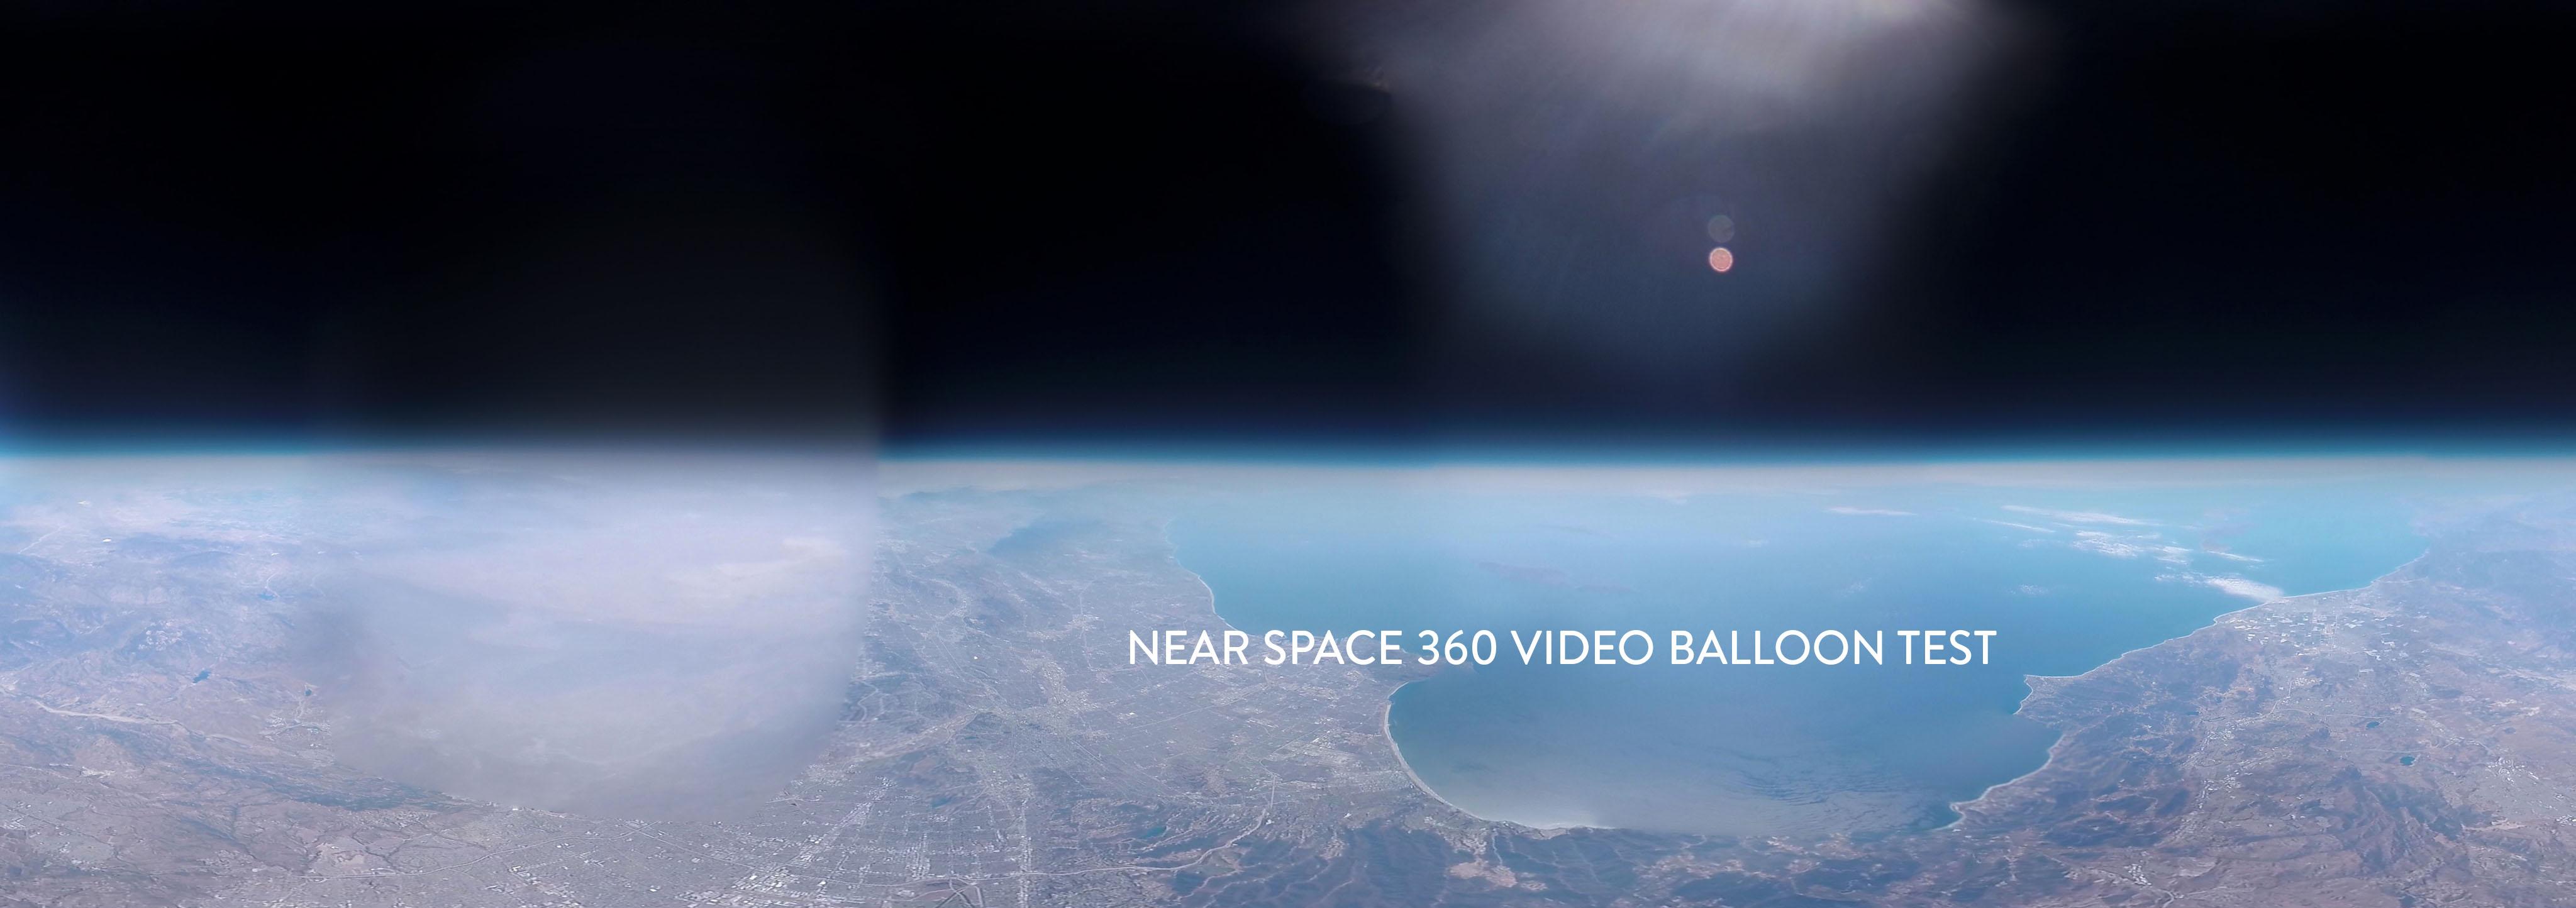 DQ_Splash__0006_NEAR SPACE 360 VIDEO BALLOON TEST